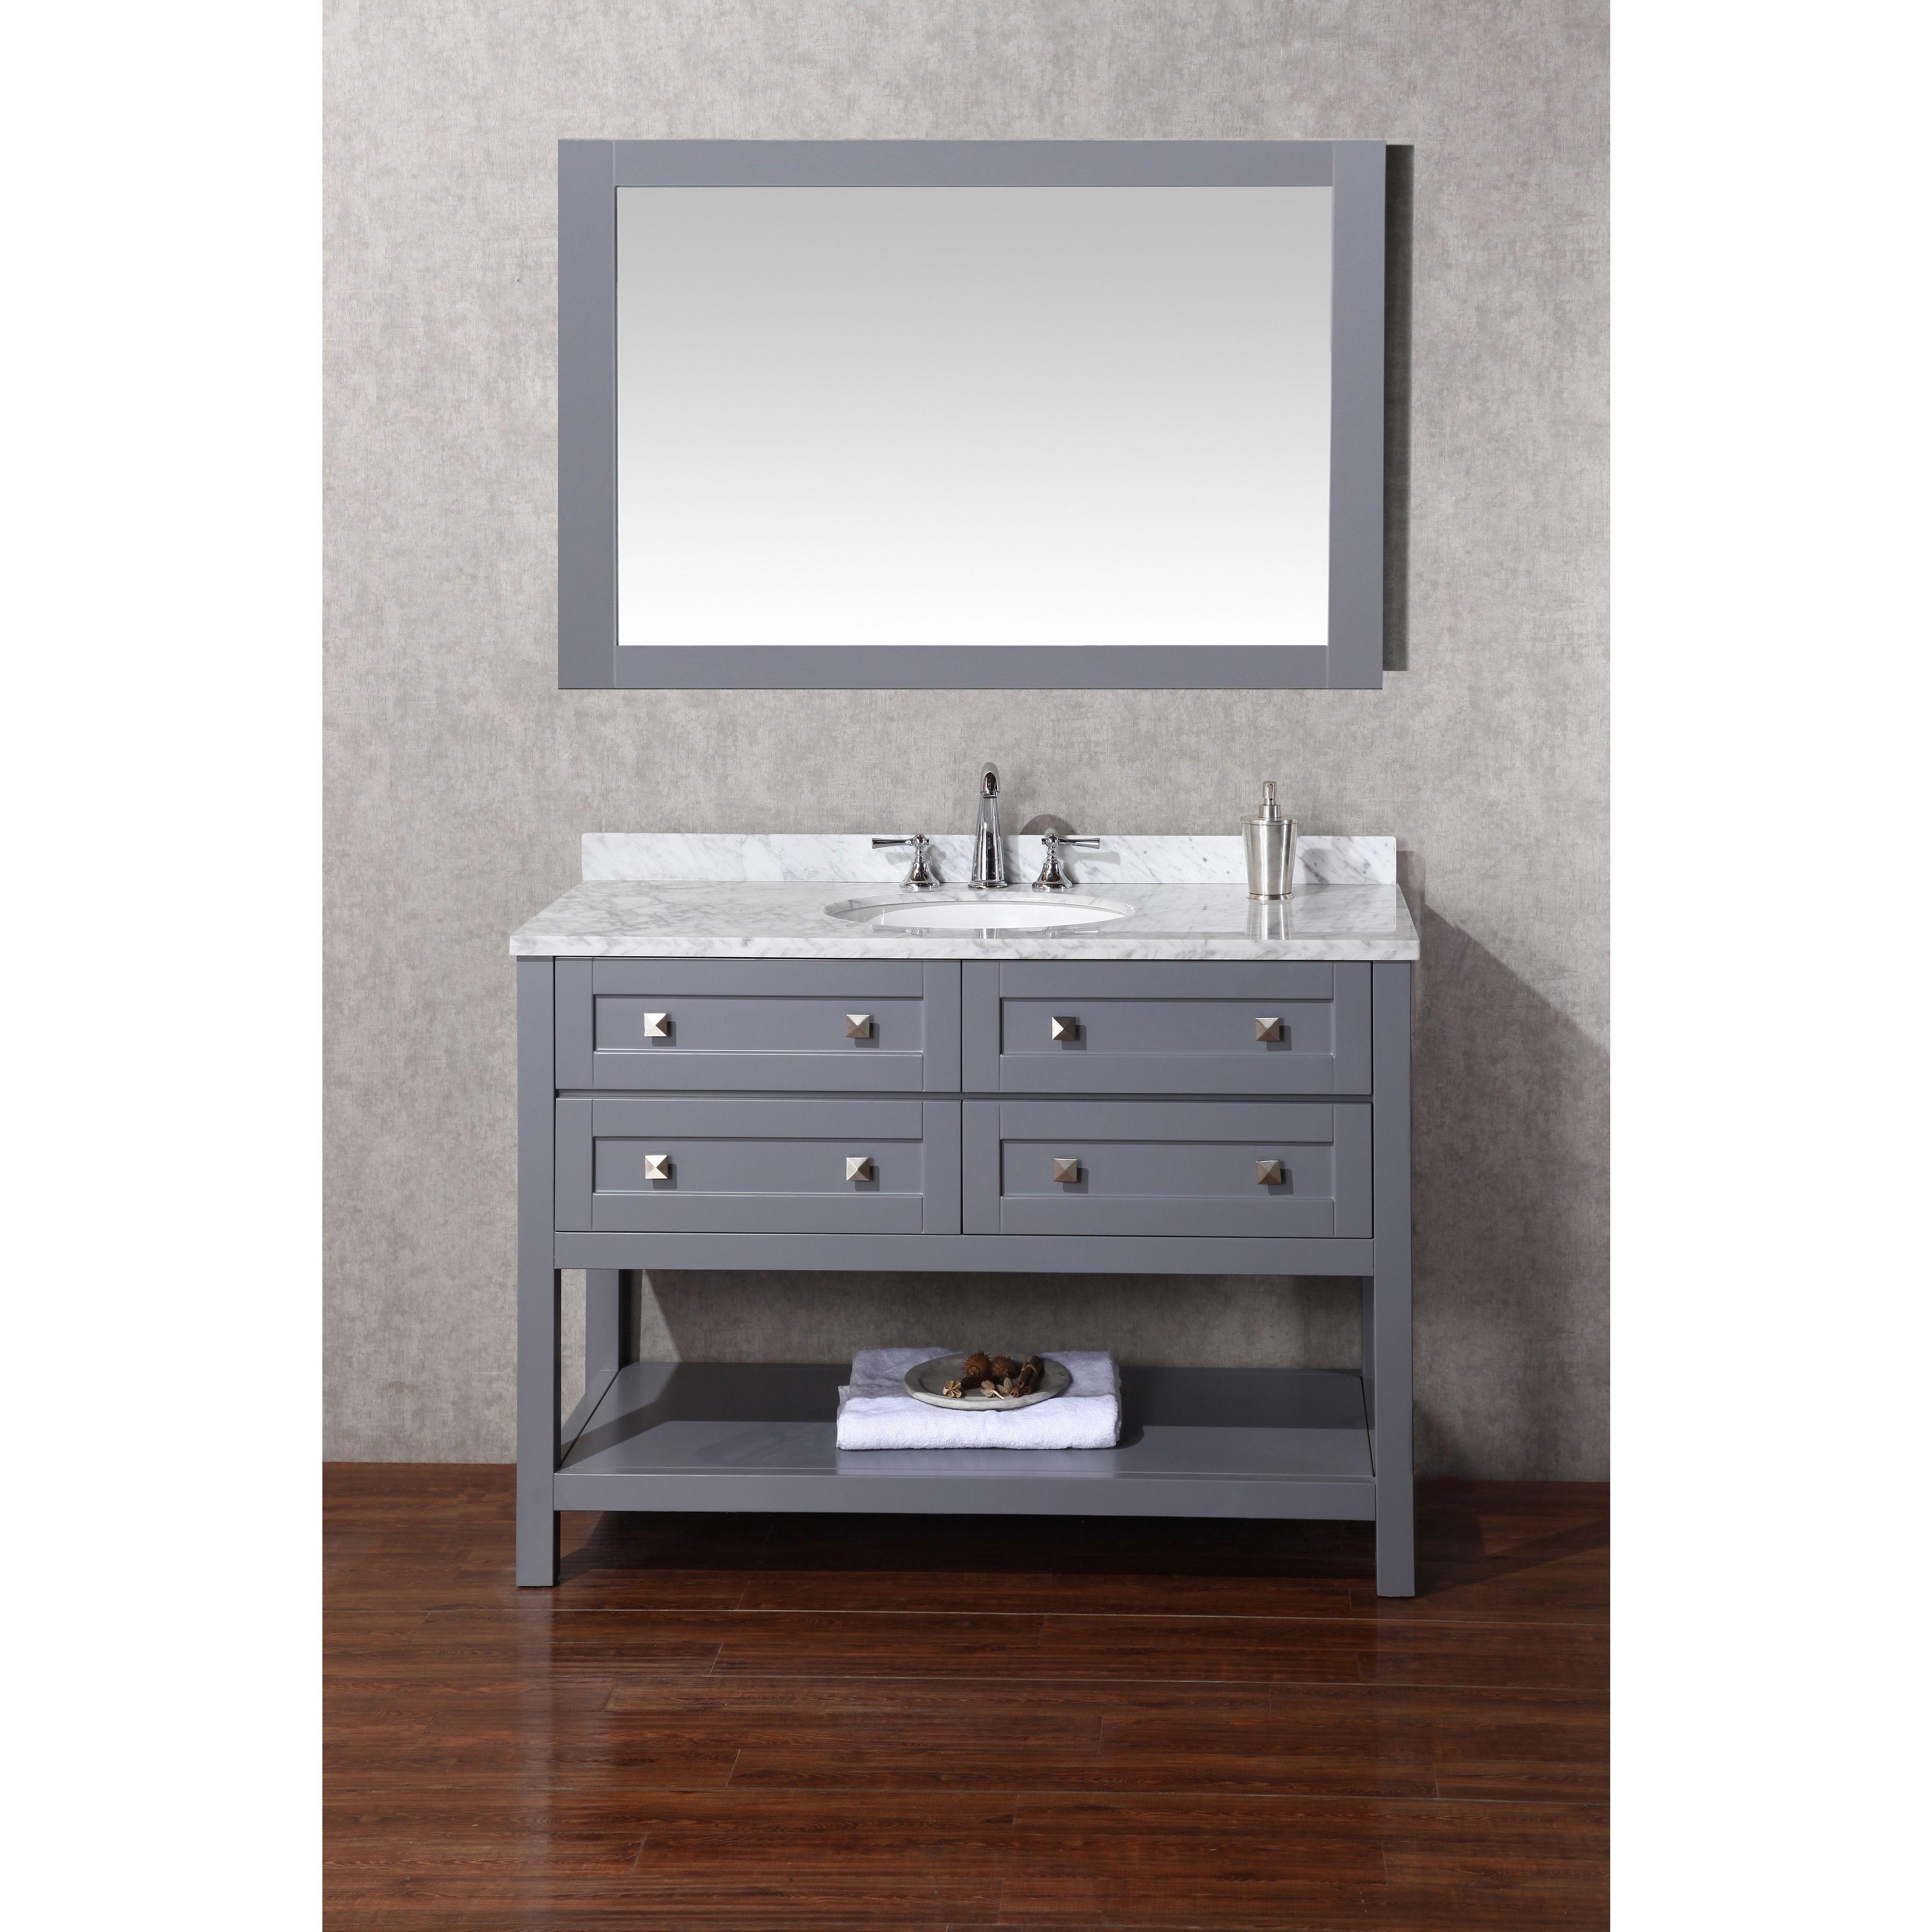 Stufurhome Marla 48 inch Single Sink Bathroom Vanity with Mirror ...